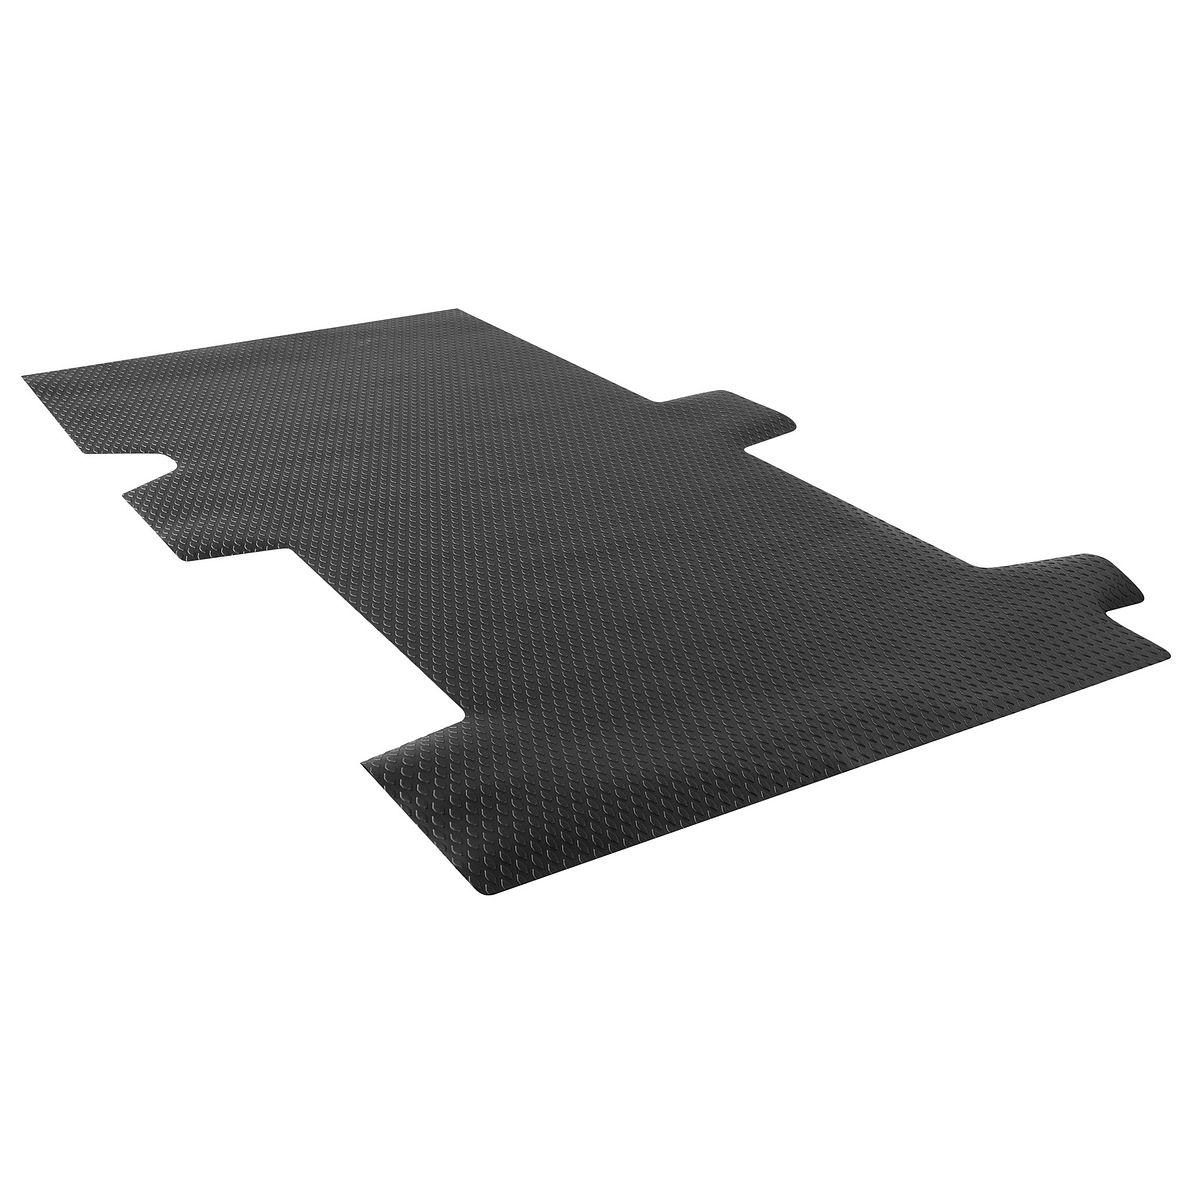 forums mats floor marketplace weathertech a cayenne attached rennlist images mat porsche for guard parts weather